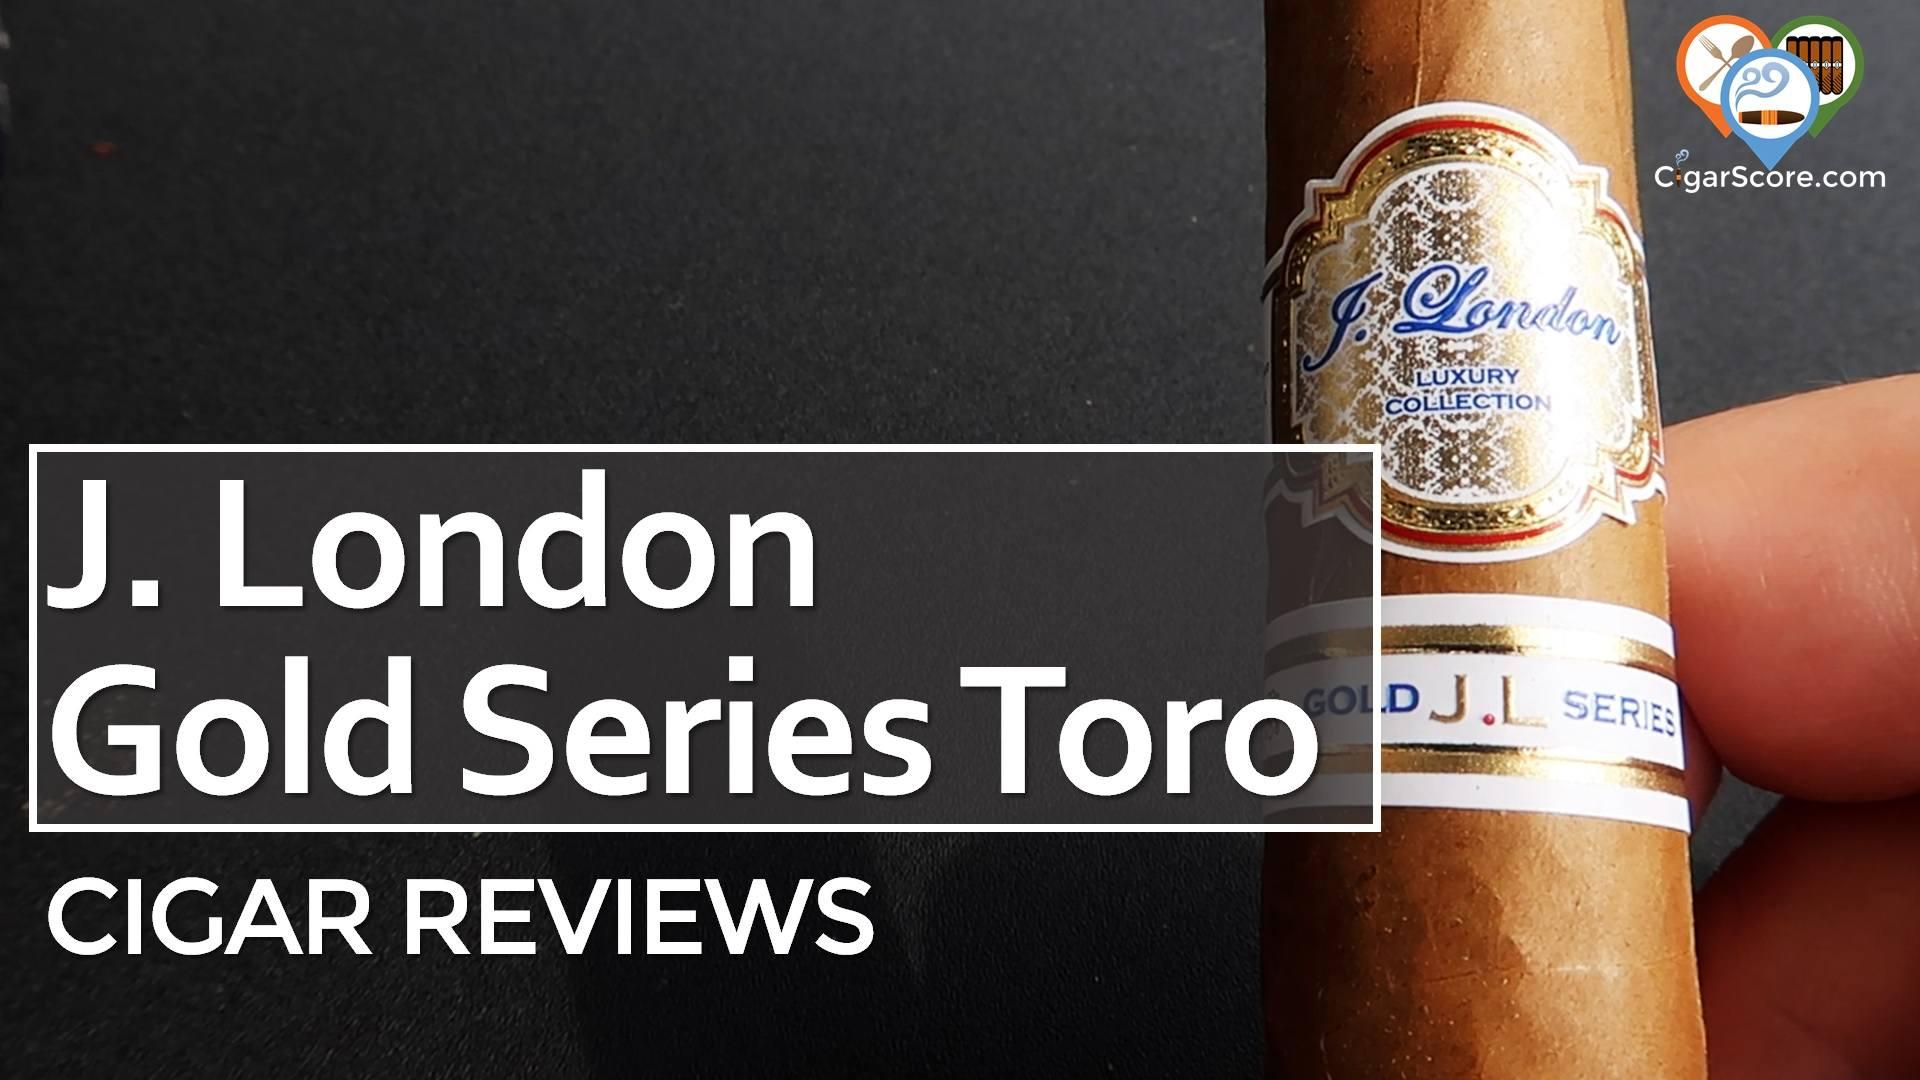 Cigar Review J. London Gold Series Toro